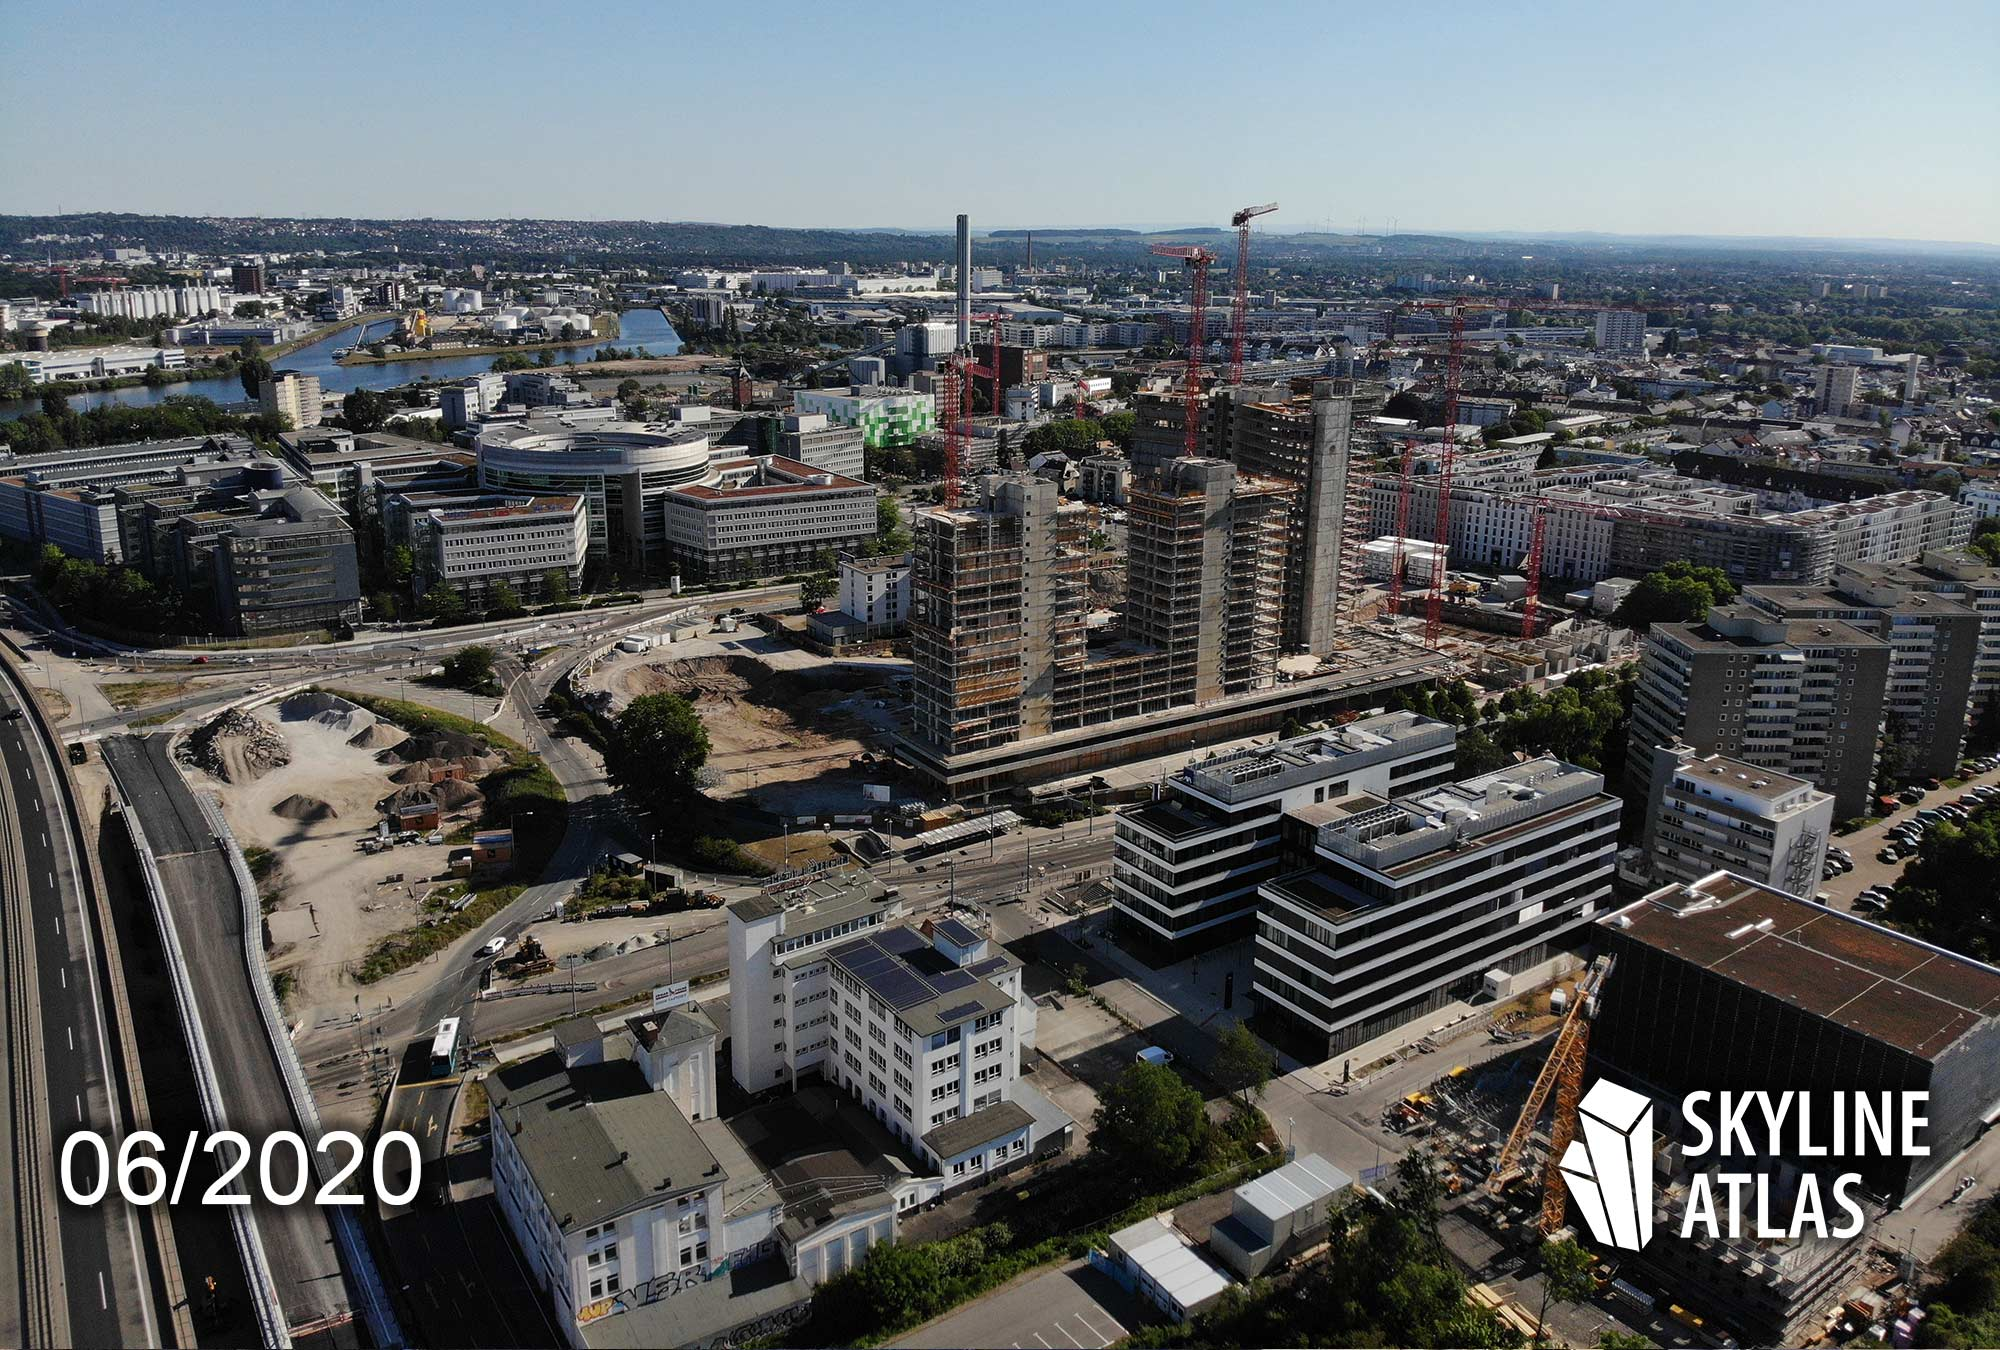 Kaiserleigebiet Offenbach am Main - Luftaufnahme Offenbach - Drohnenaufnahme Offenbach Kaiserlei - New Frankfurt Towers - Vitopia Campus - AXA Offenbach Kaiserlei